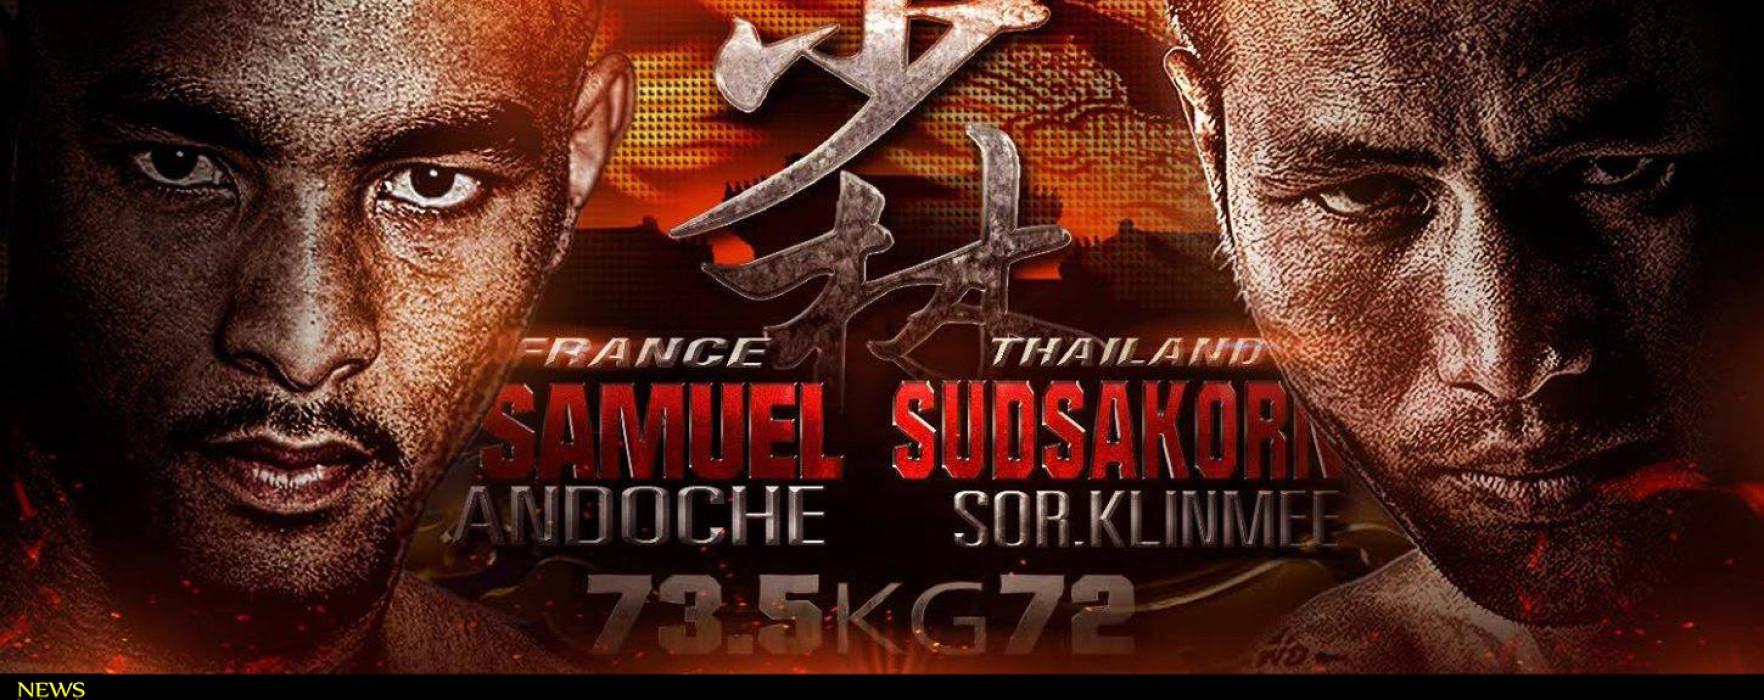 Video: Thai Fight Shaolin – 18 July 2015